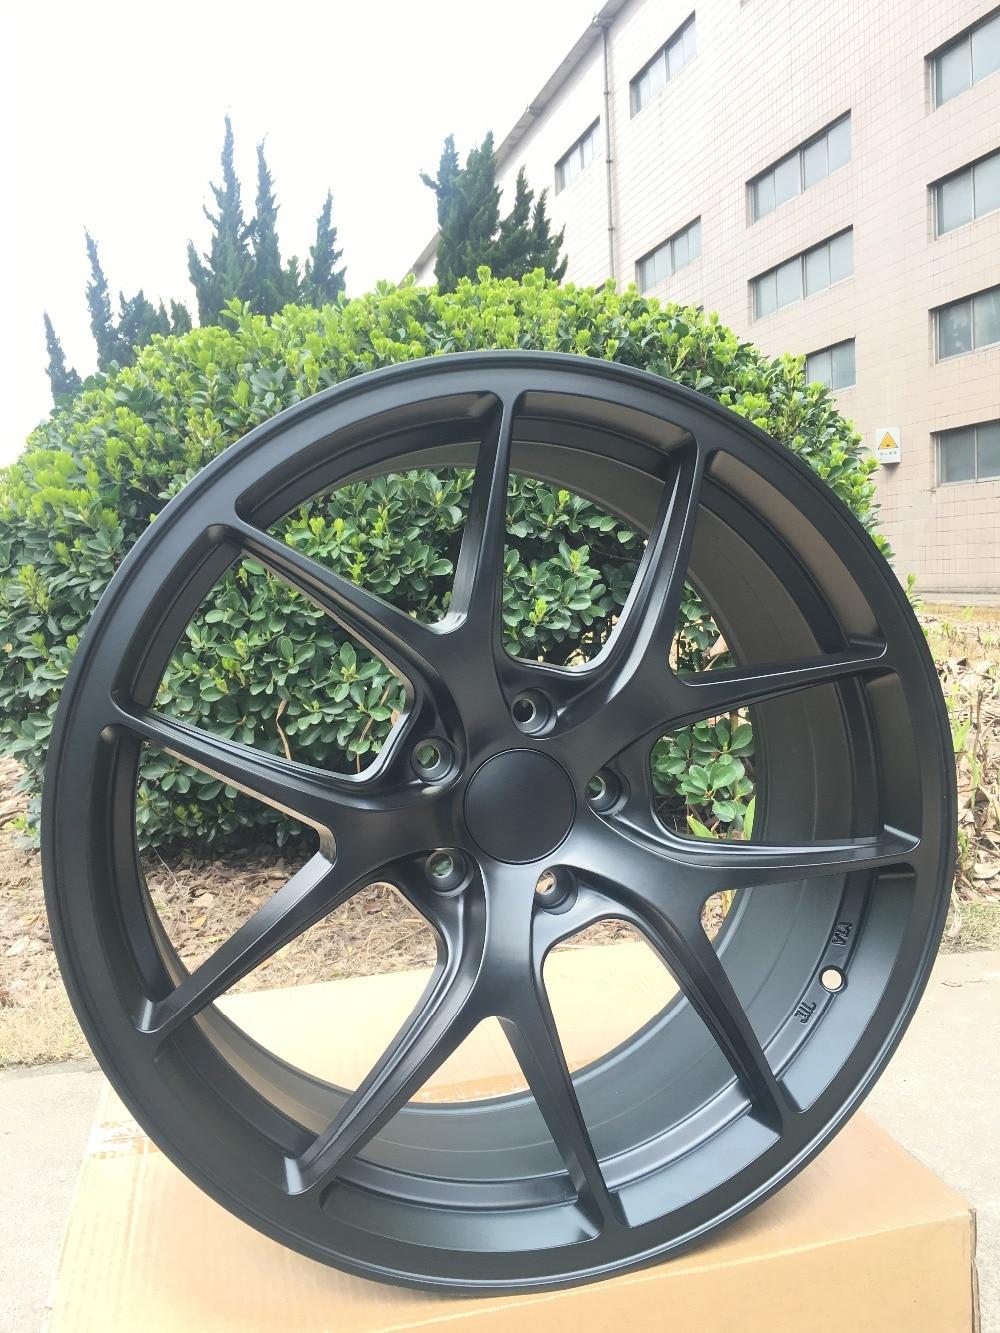 Alloy Wheel Rims 4 New 19 Satin Black Rims wheels Fits all Honda Civic 2006 2016